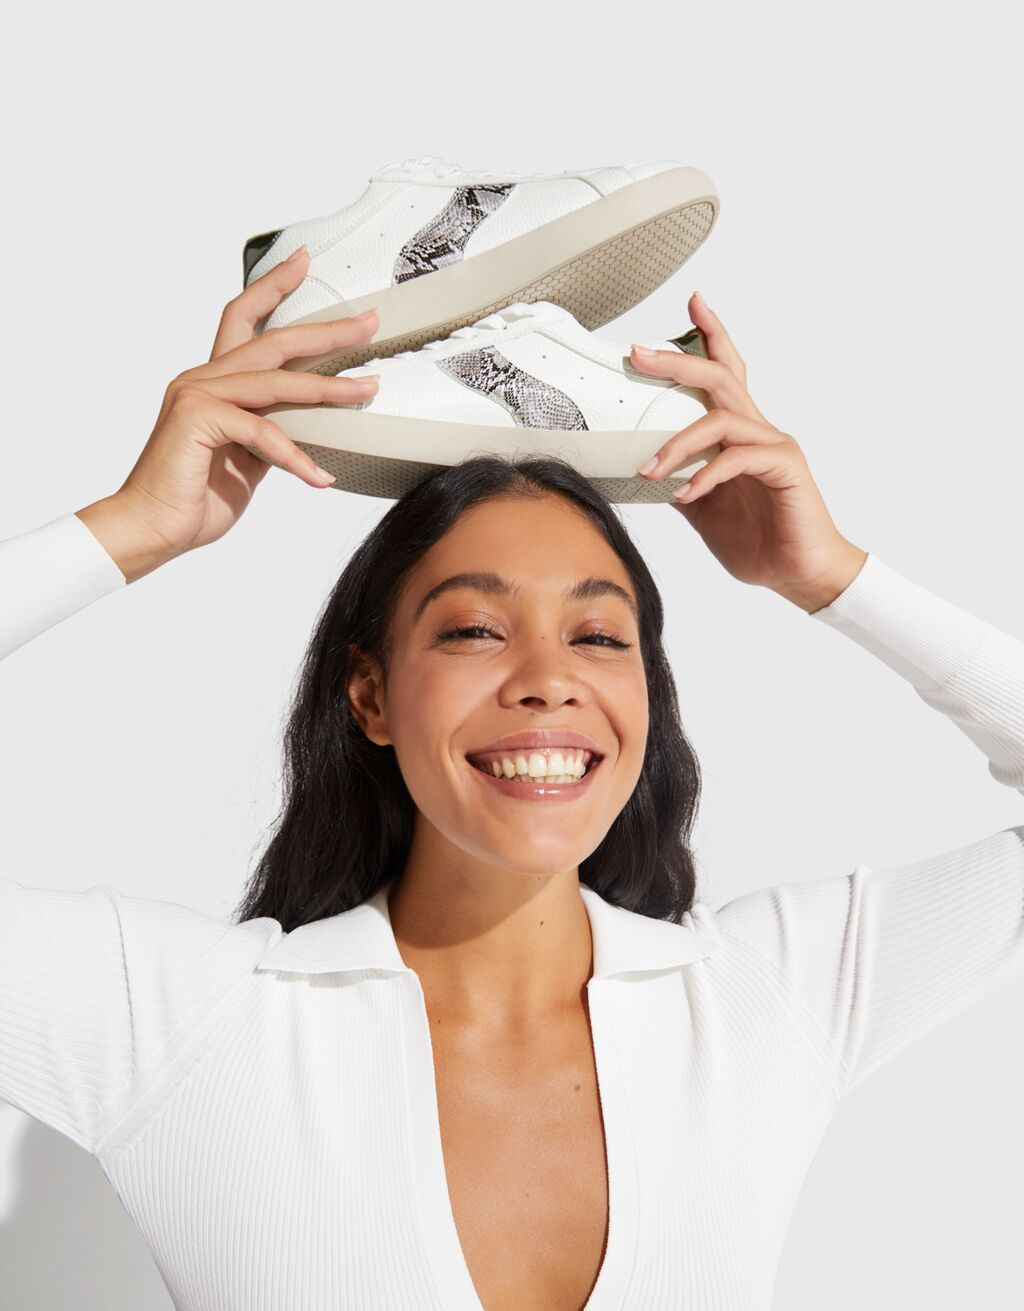 Plateau-Sneaker mit Prägung und Tierprint-Detail - Schuhe - Damen